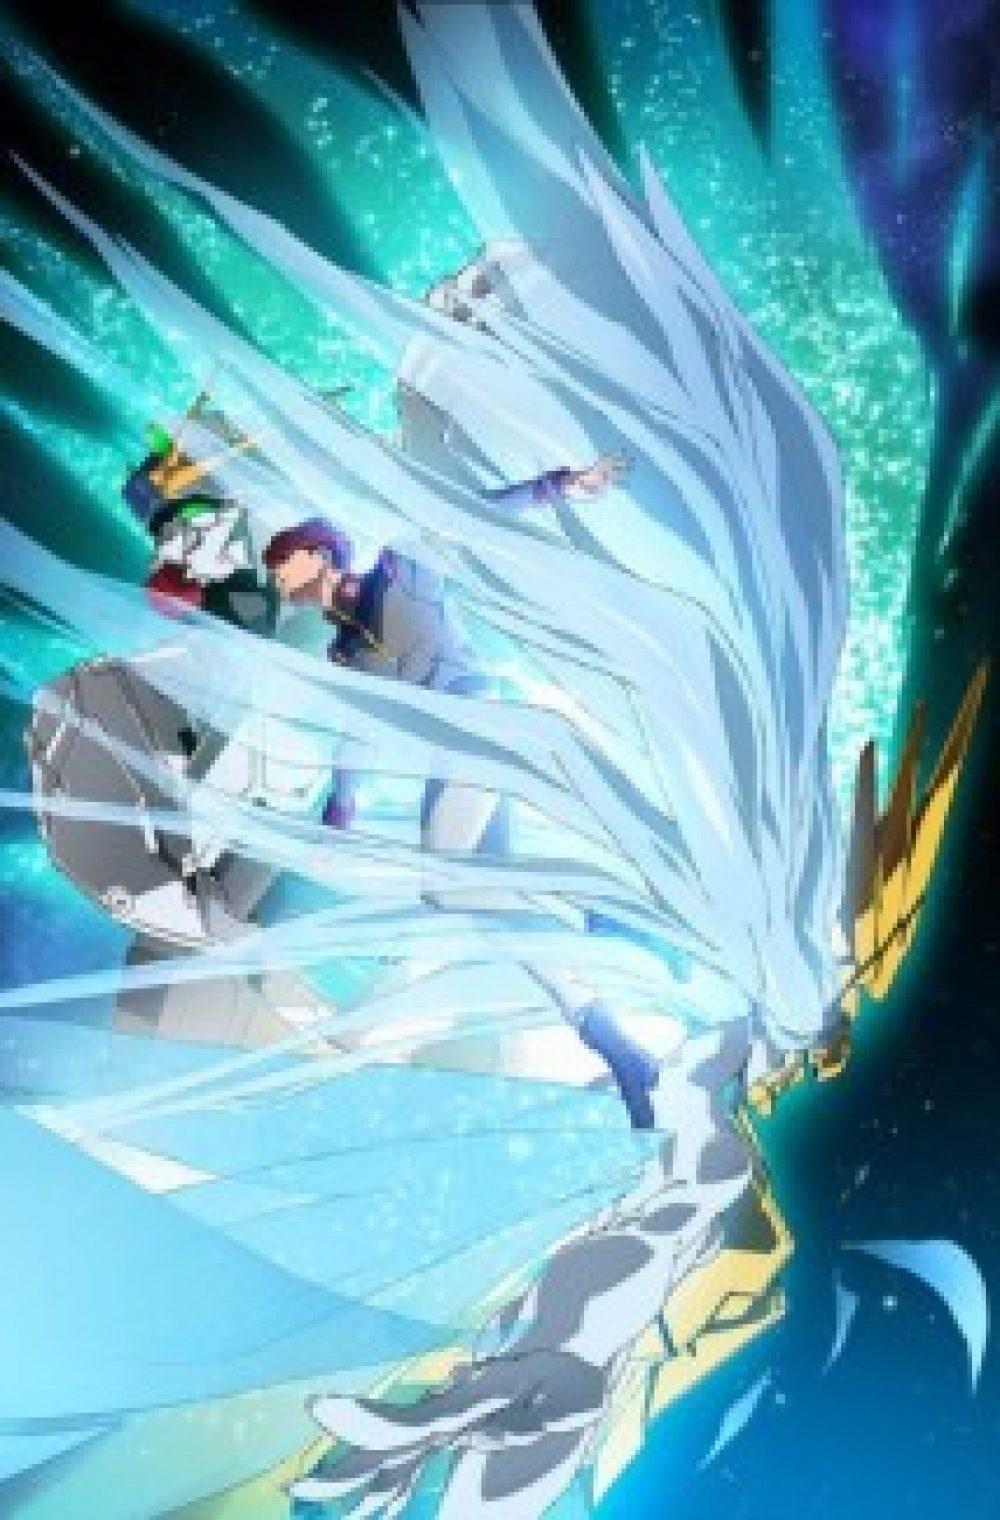 (DUB) Mobile Suit Gundam Narrative